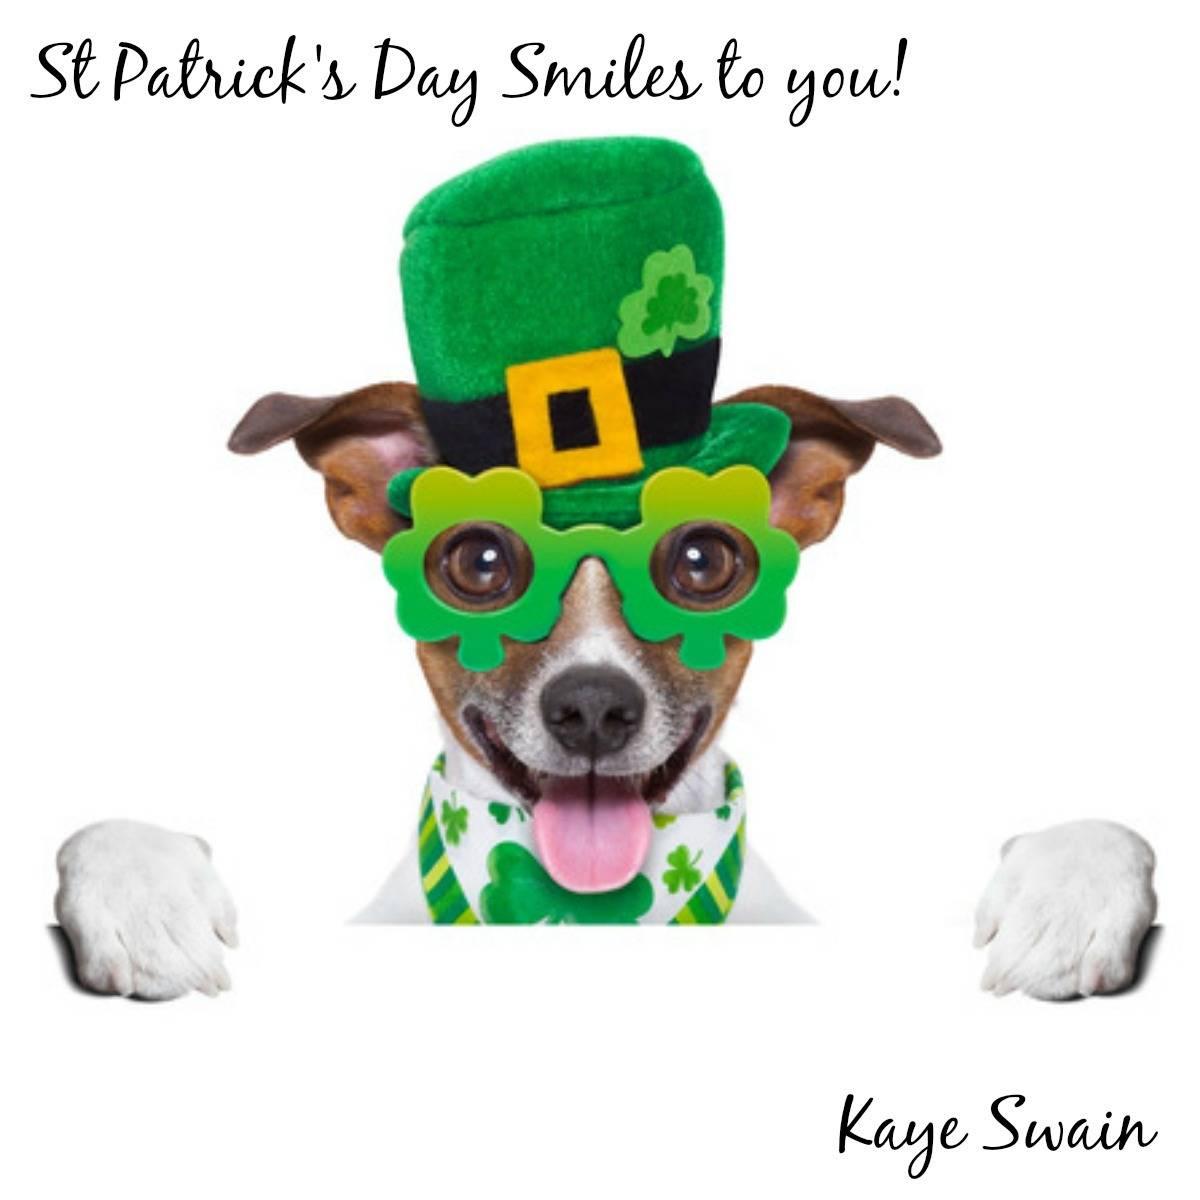 Happy-St-Patricks-Day-says-Kaye-Swain-Sacramento-Roseville-real-estate-agent-blogger